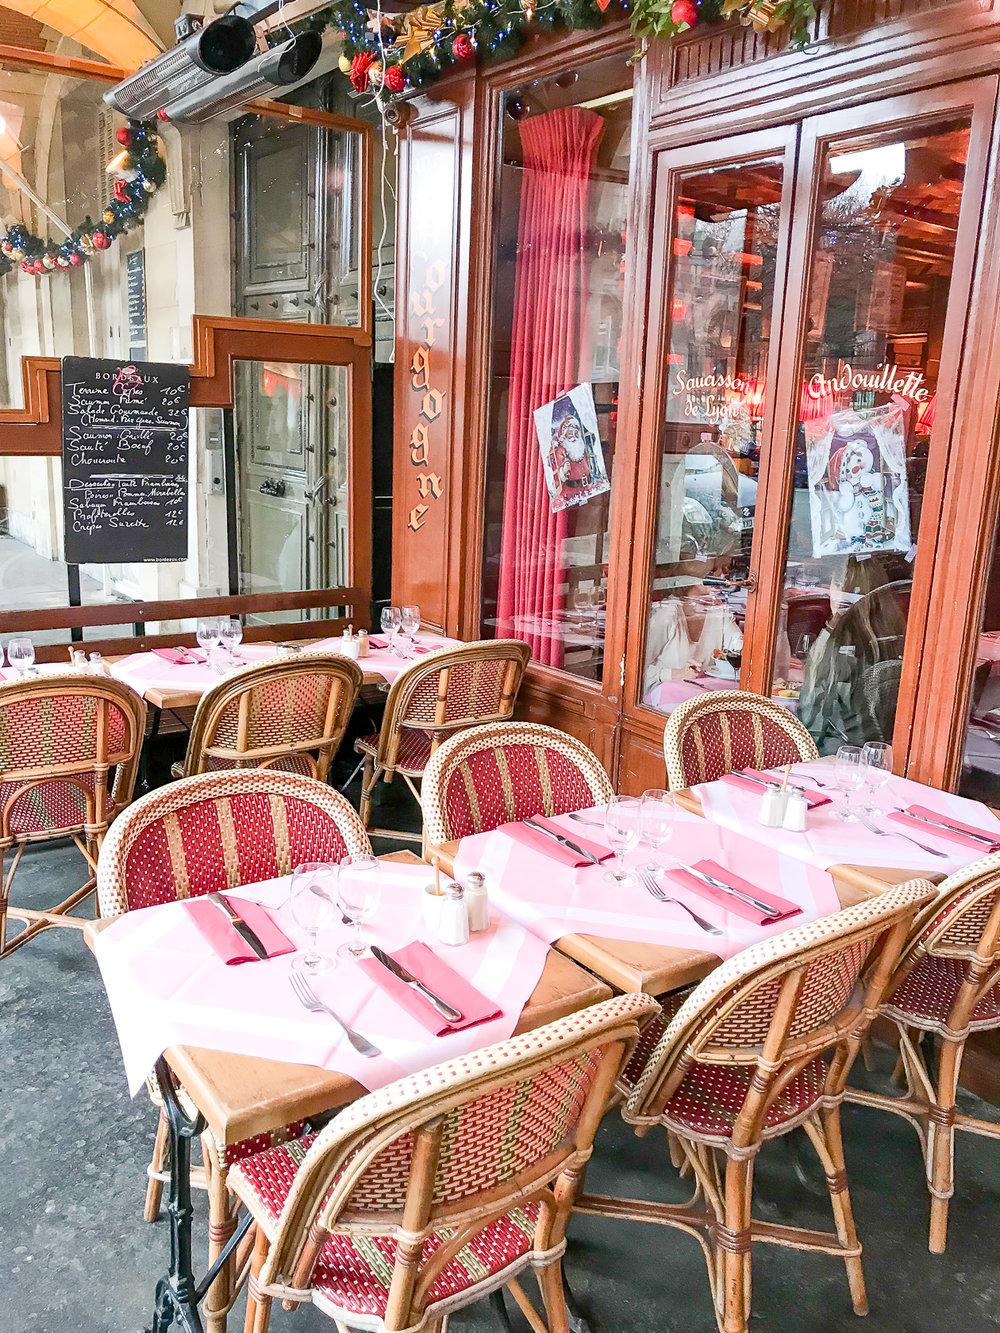 Cafe in Place des Vosges